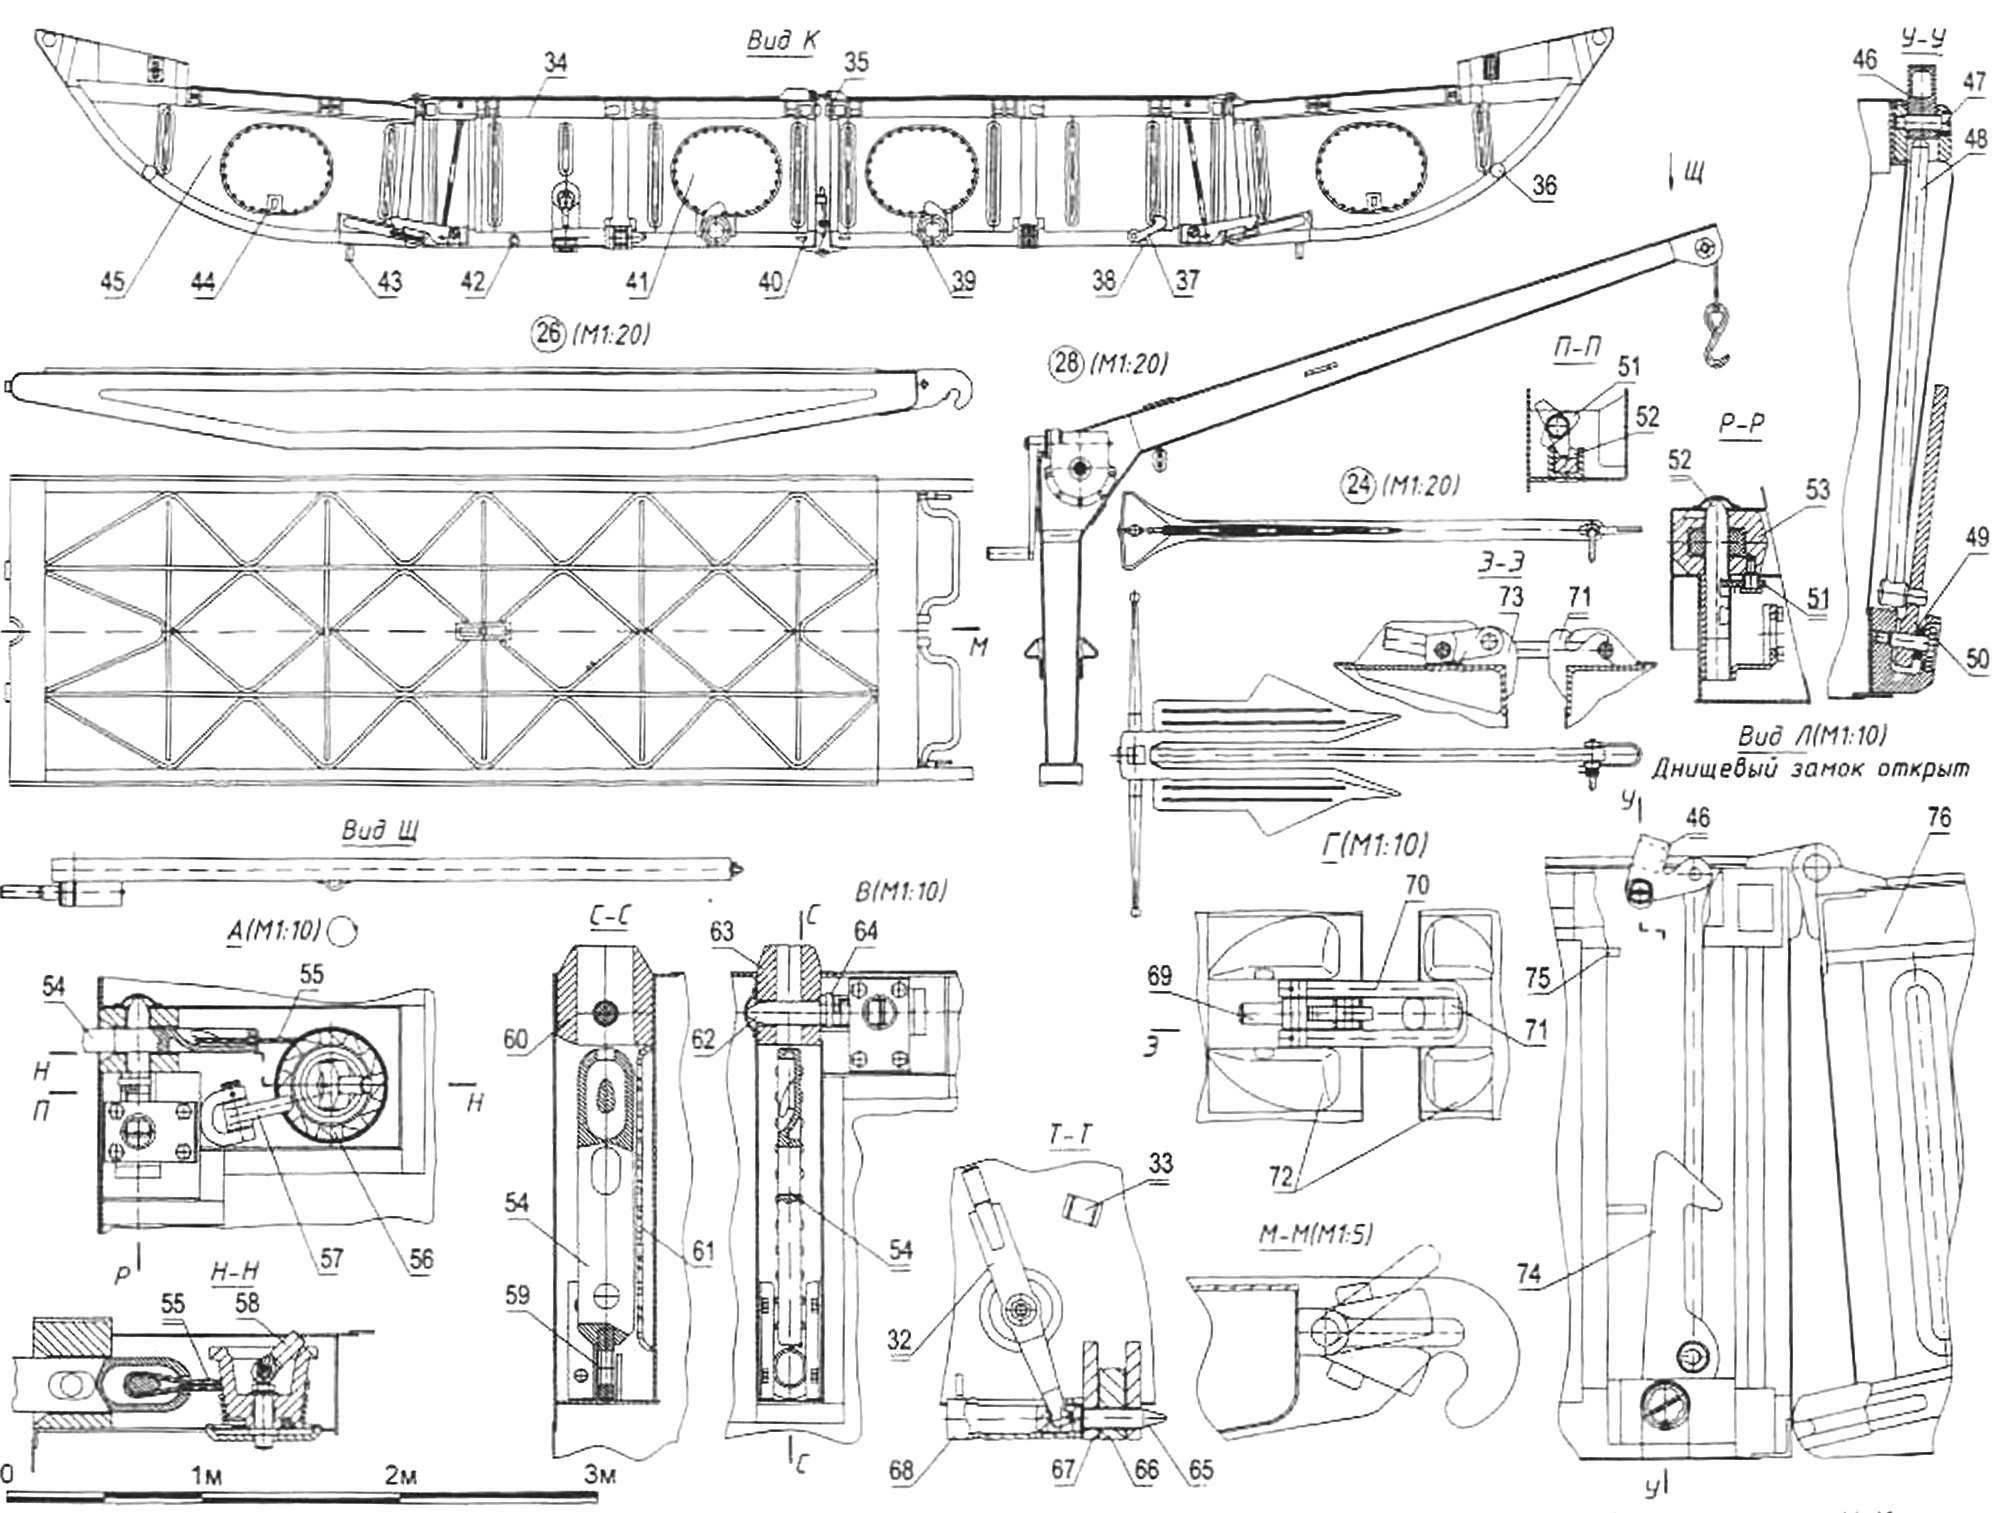 tags: #vfd connection diagram#vfd motor diagram#vfd schematic diagram and  control#vfd motor wiring#vfd bypass wiring diagram#logic diagram vfd#vfd  line